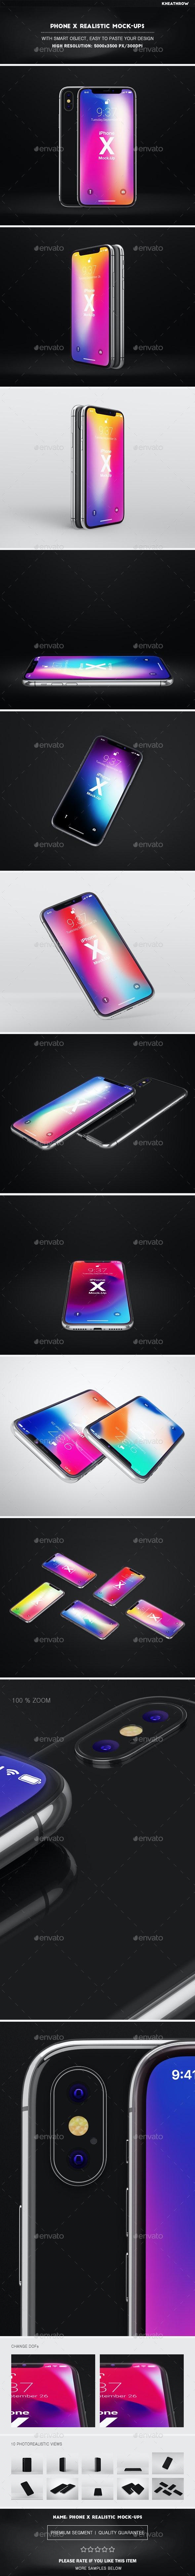 Phone X Realistic Mock-Ups - Mobile Displays